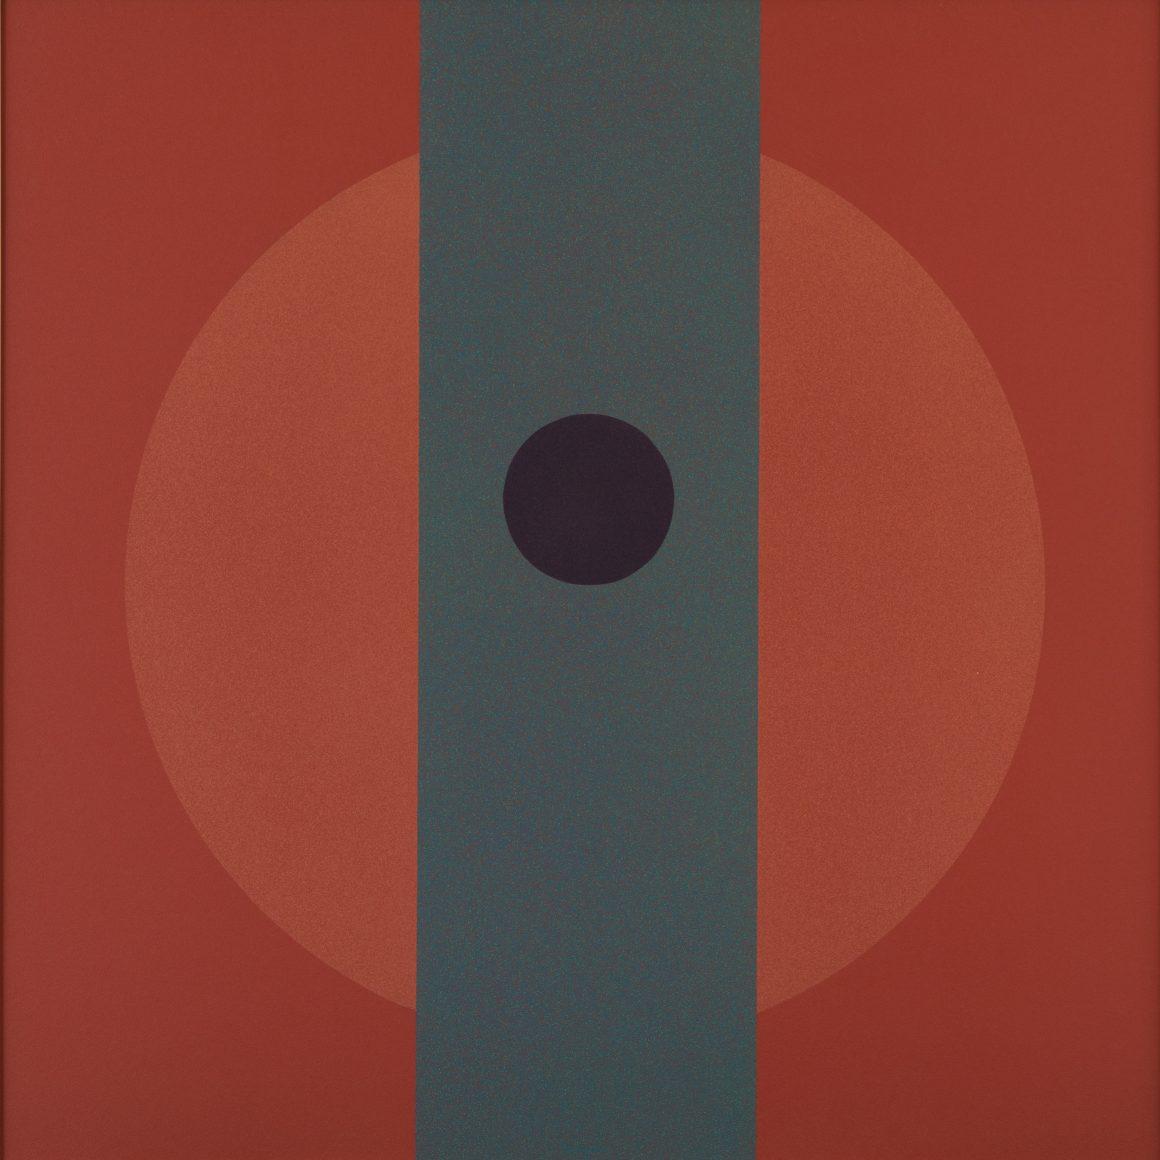 Polymer No. 8, 1966, Acrylic on board, Bequest of Raymond Jonson, Raymond Jonson Collection